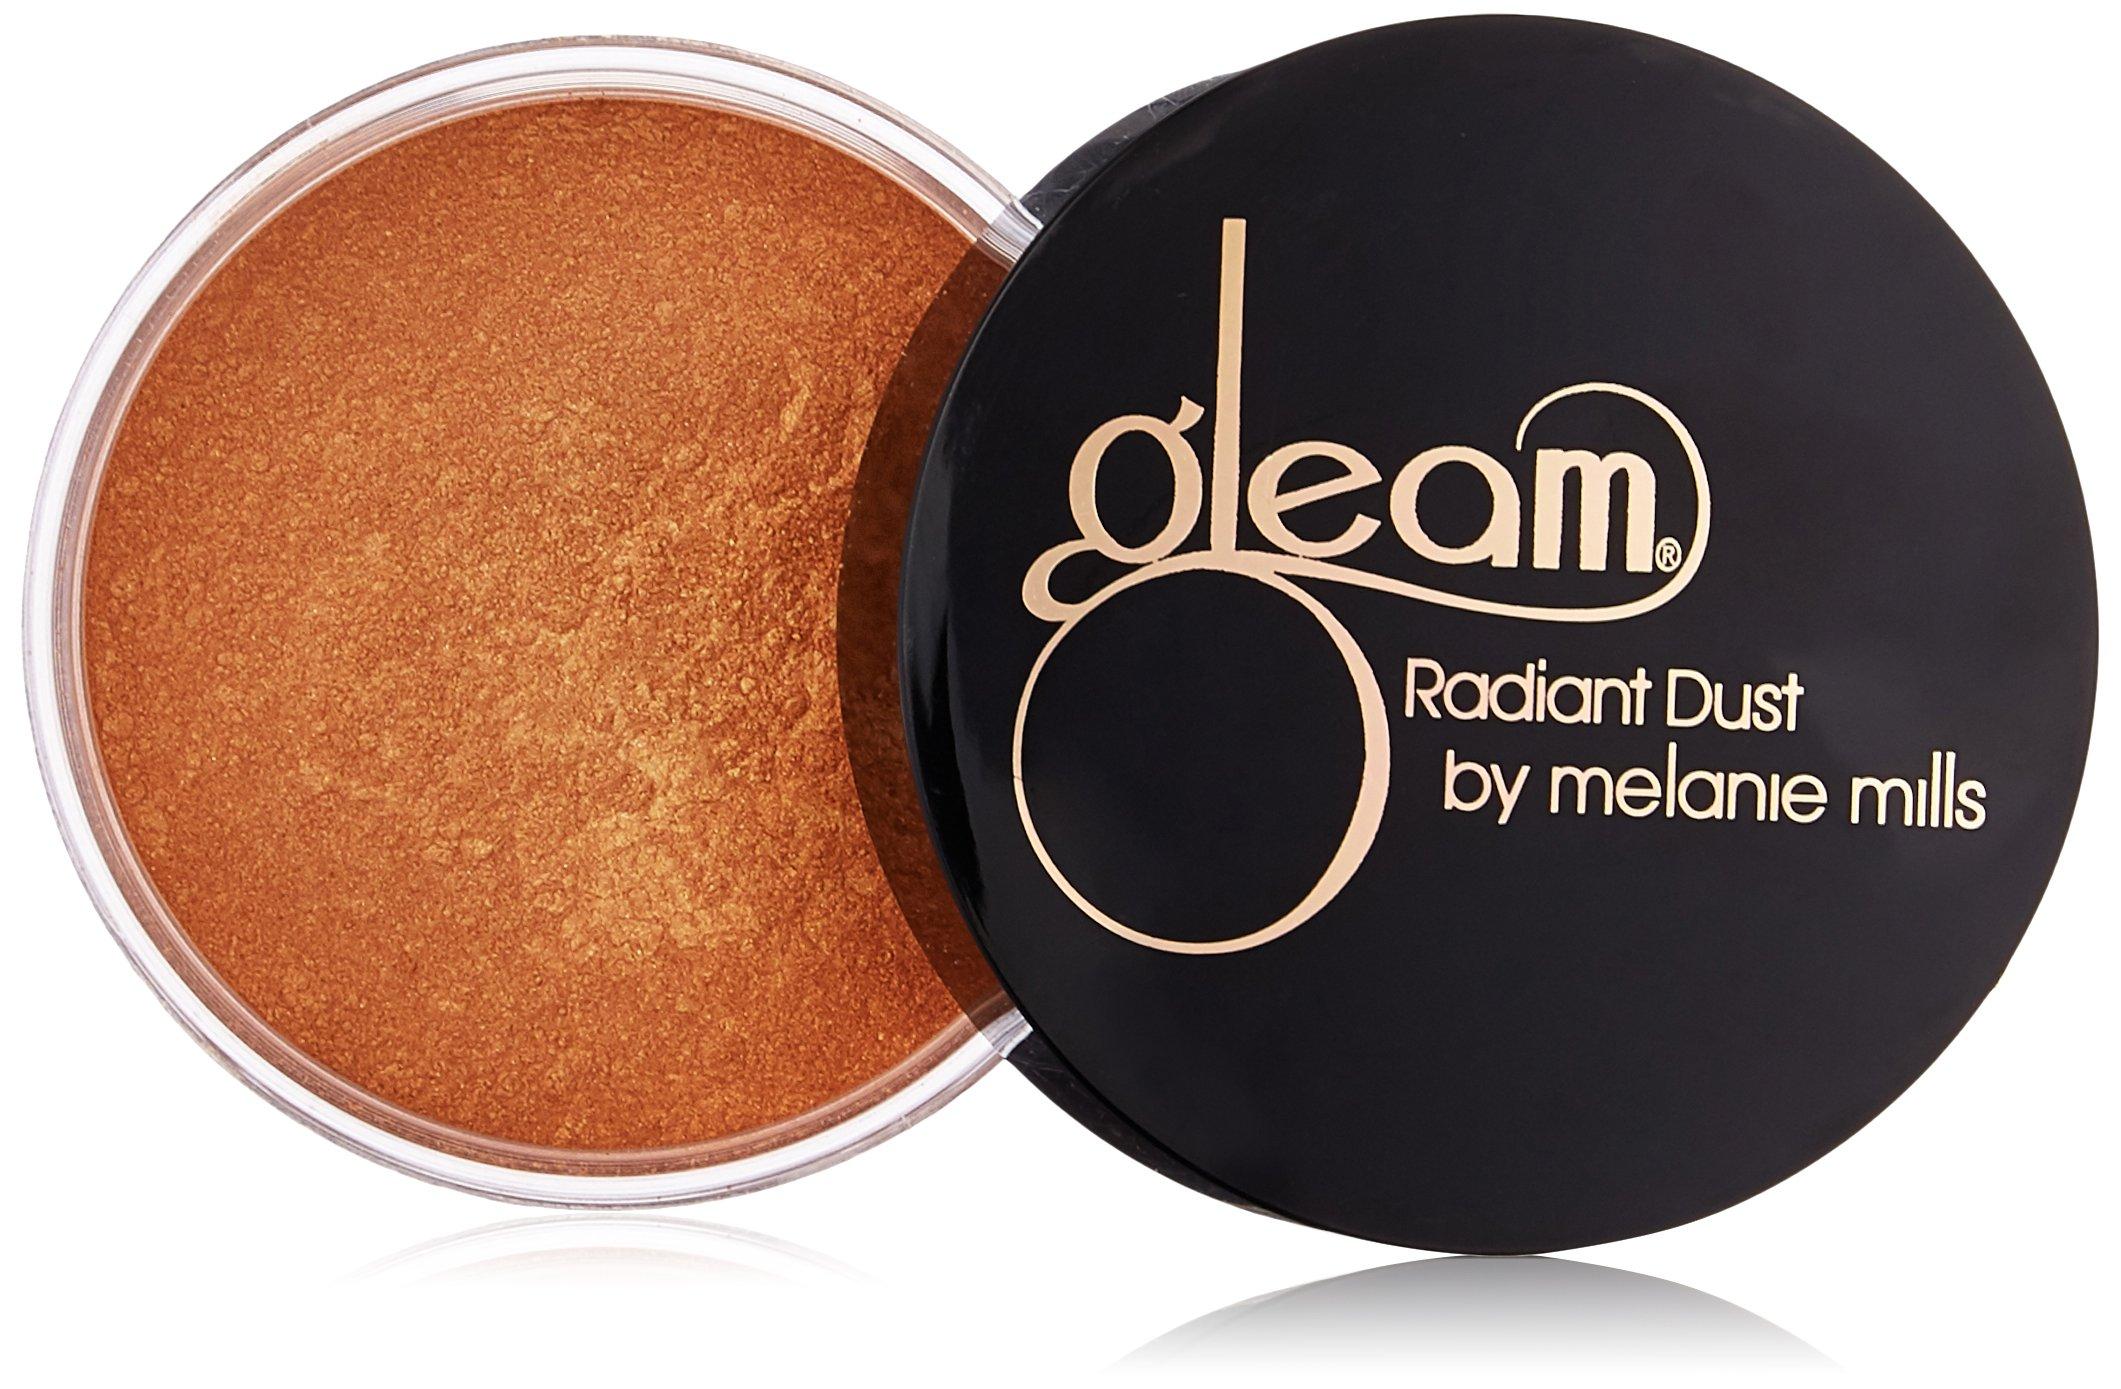 Melanie Mills Hollywood Gleam Radiant Dust Bronzing Powder - Deep Gold, 30g